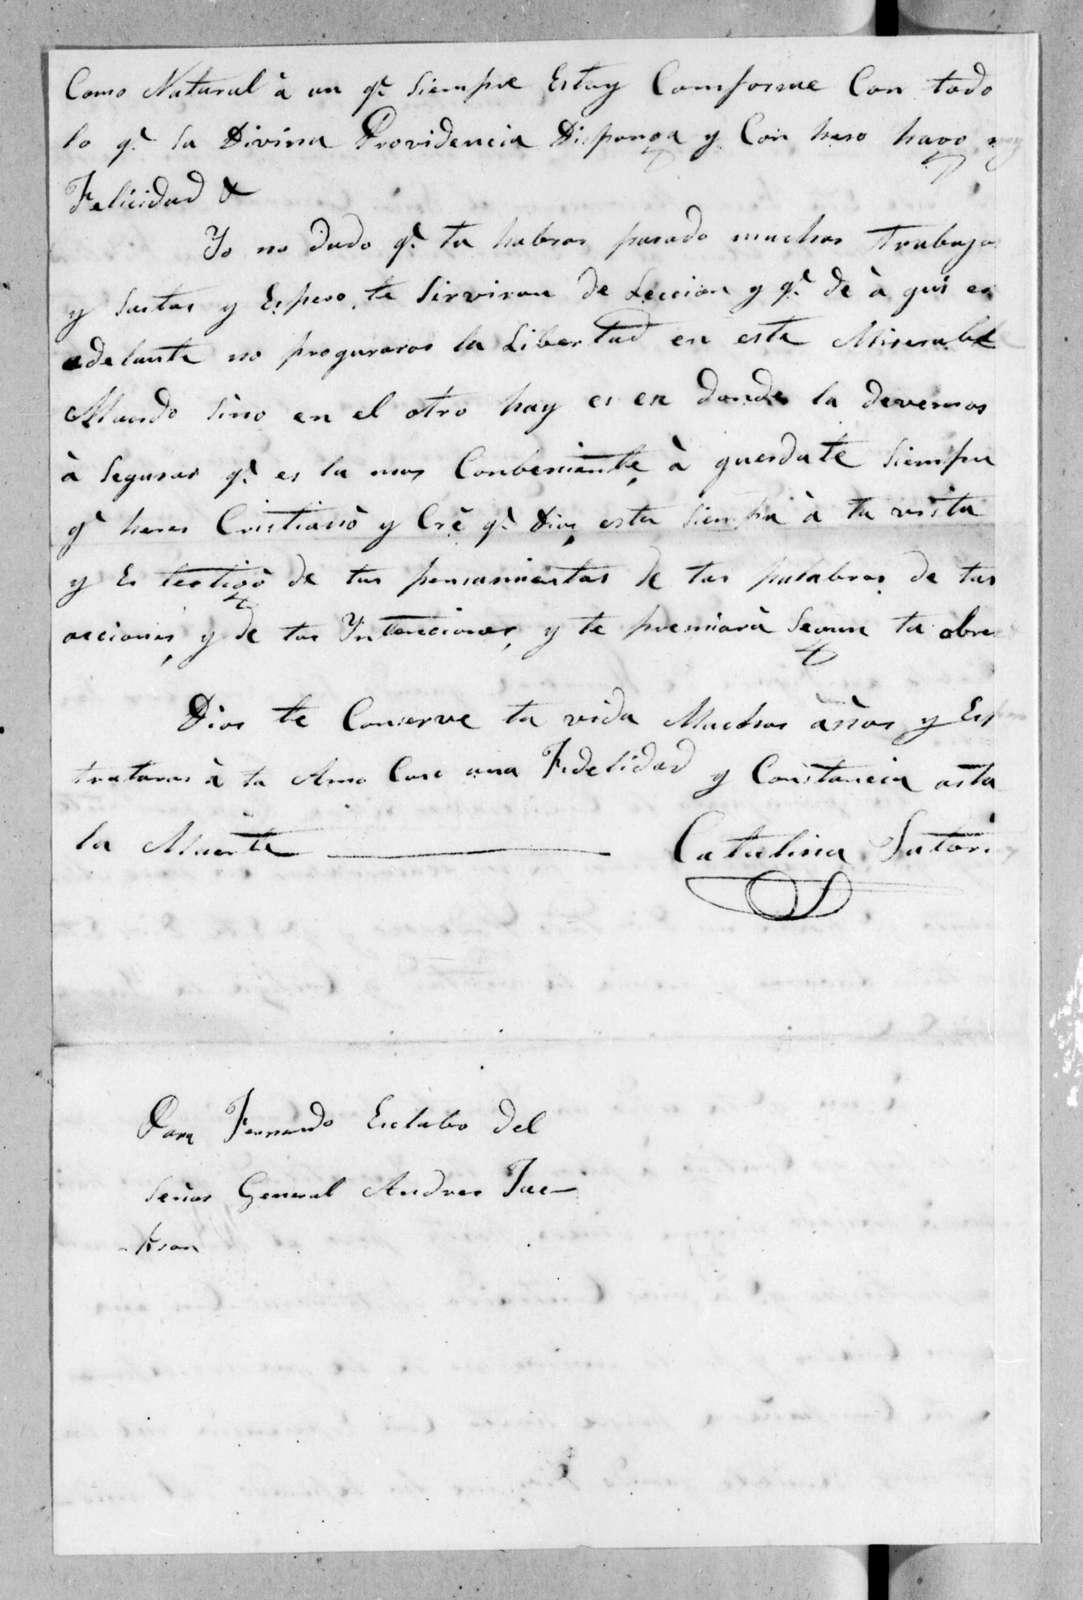 Catalina Mir Satorios to Andrew Jackson, June 14, 1822